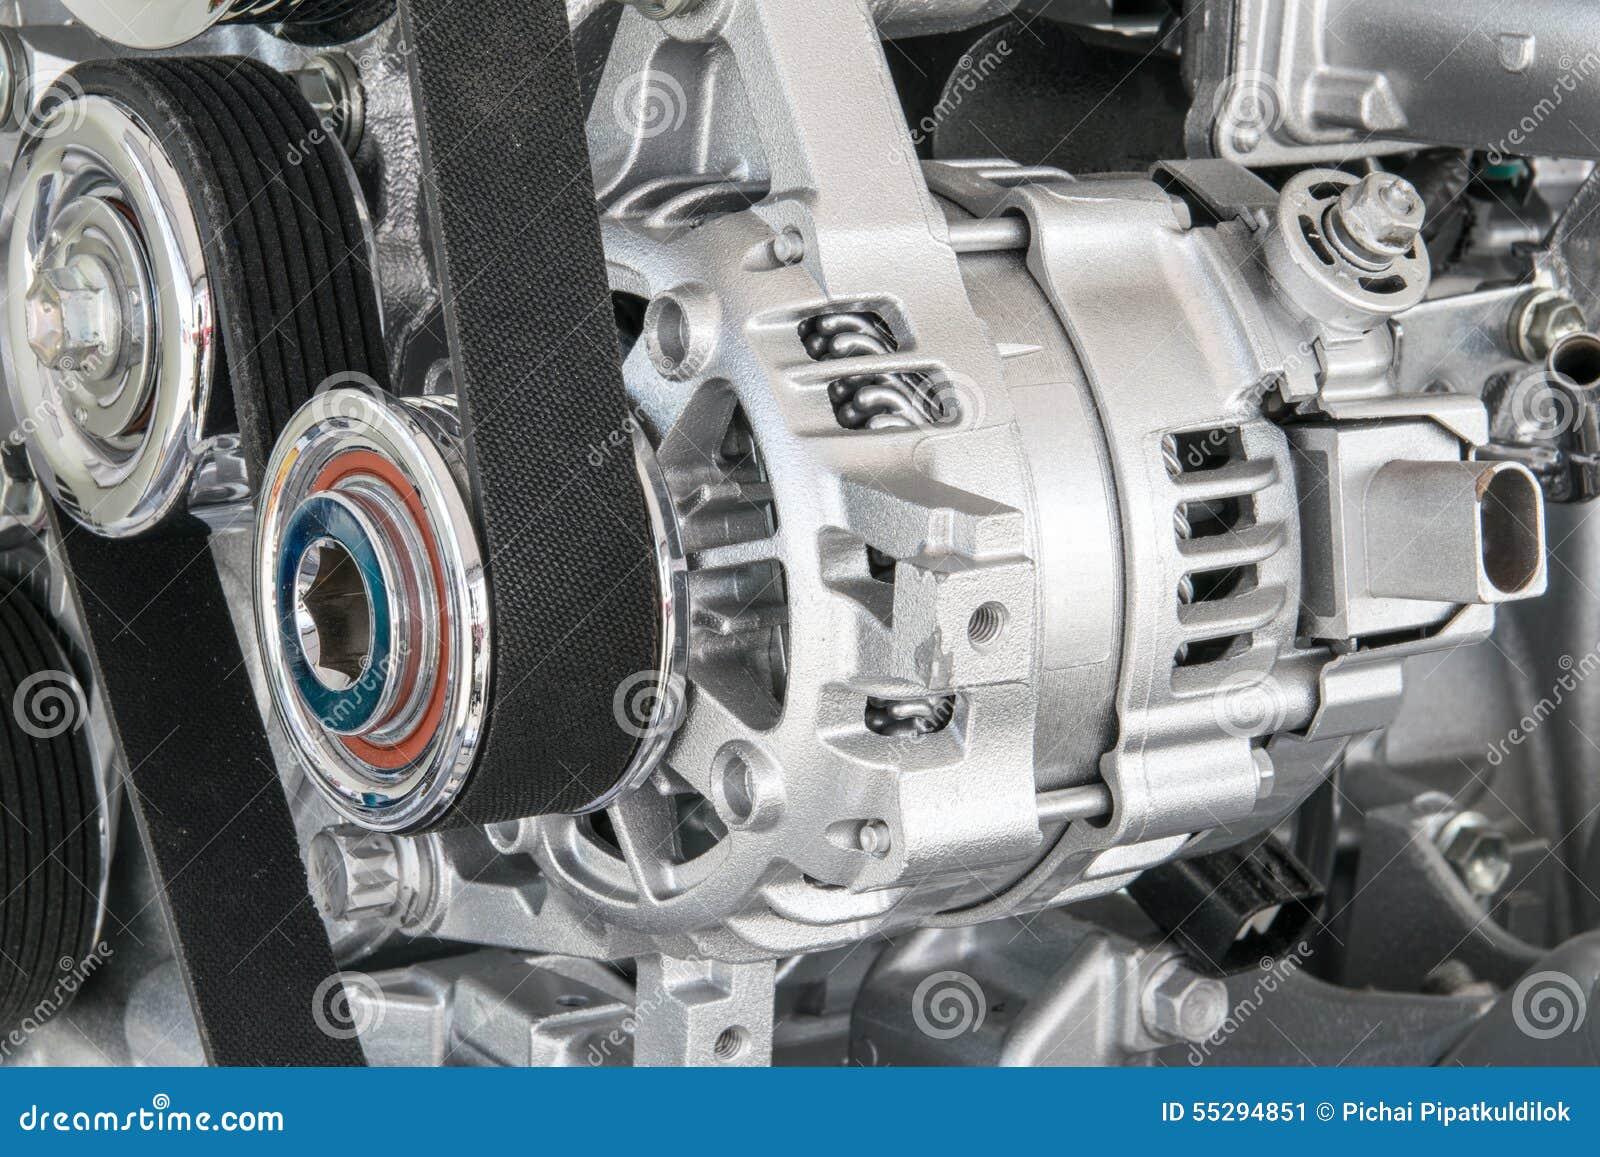 Atemberaubend Automotor Teile Namen Galerie - Schaltplan Serie ...